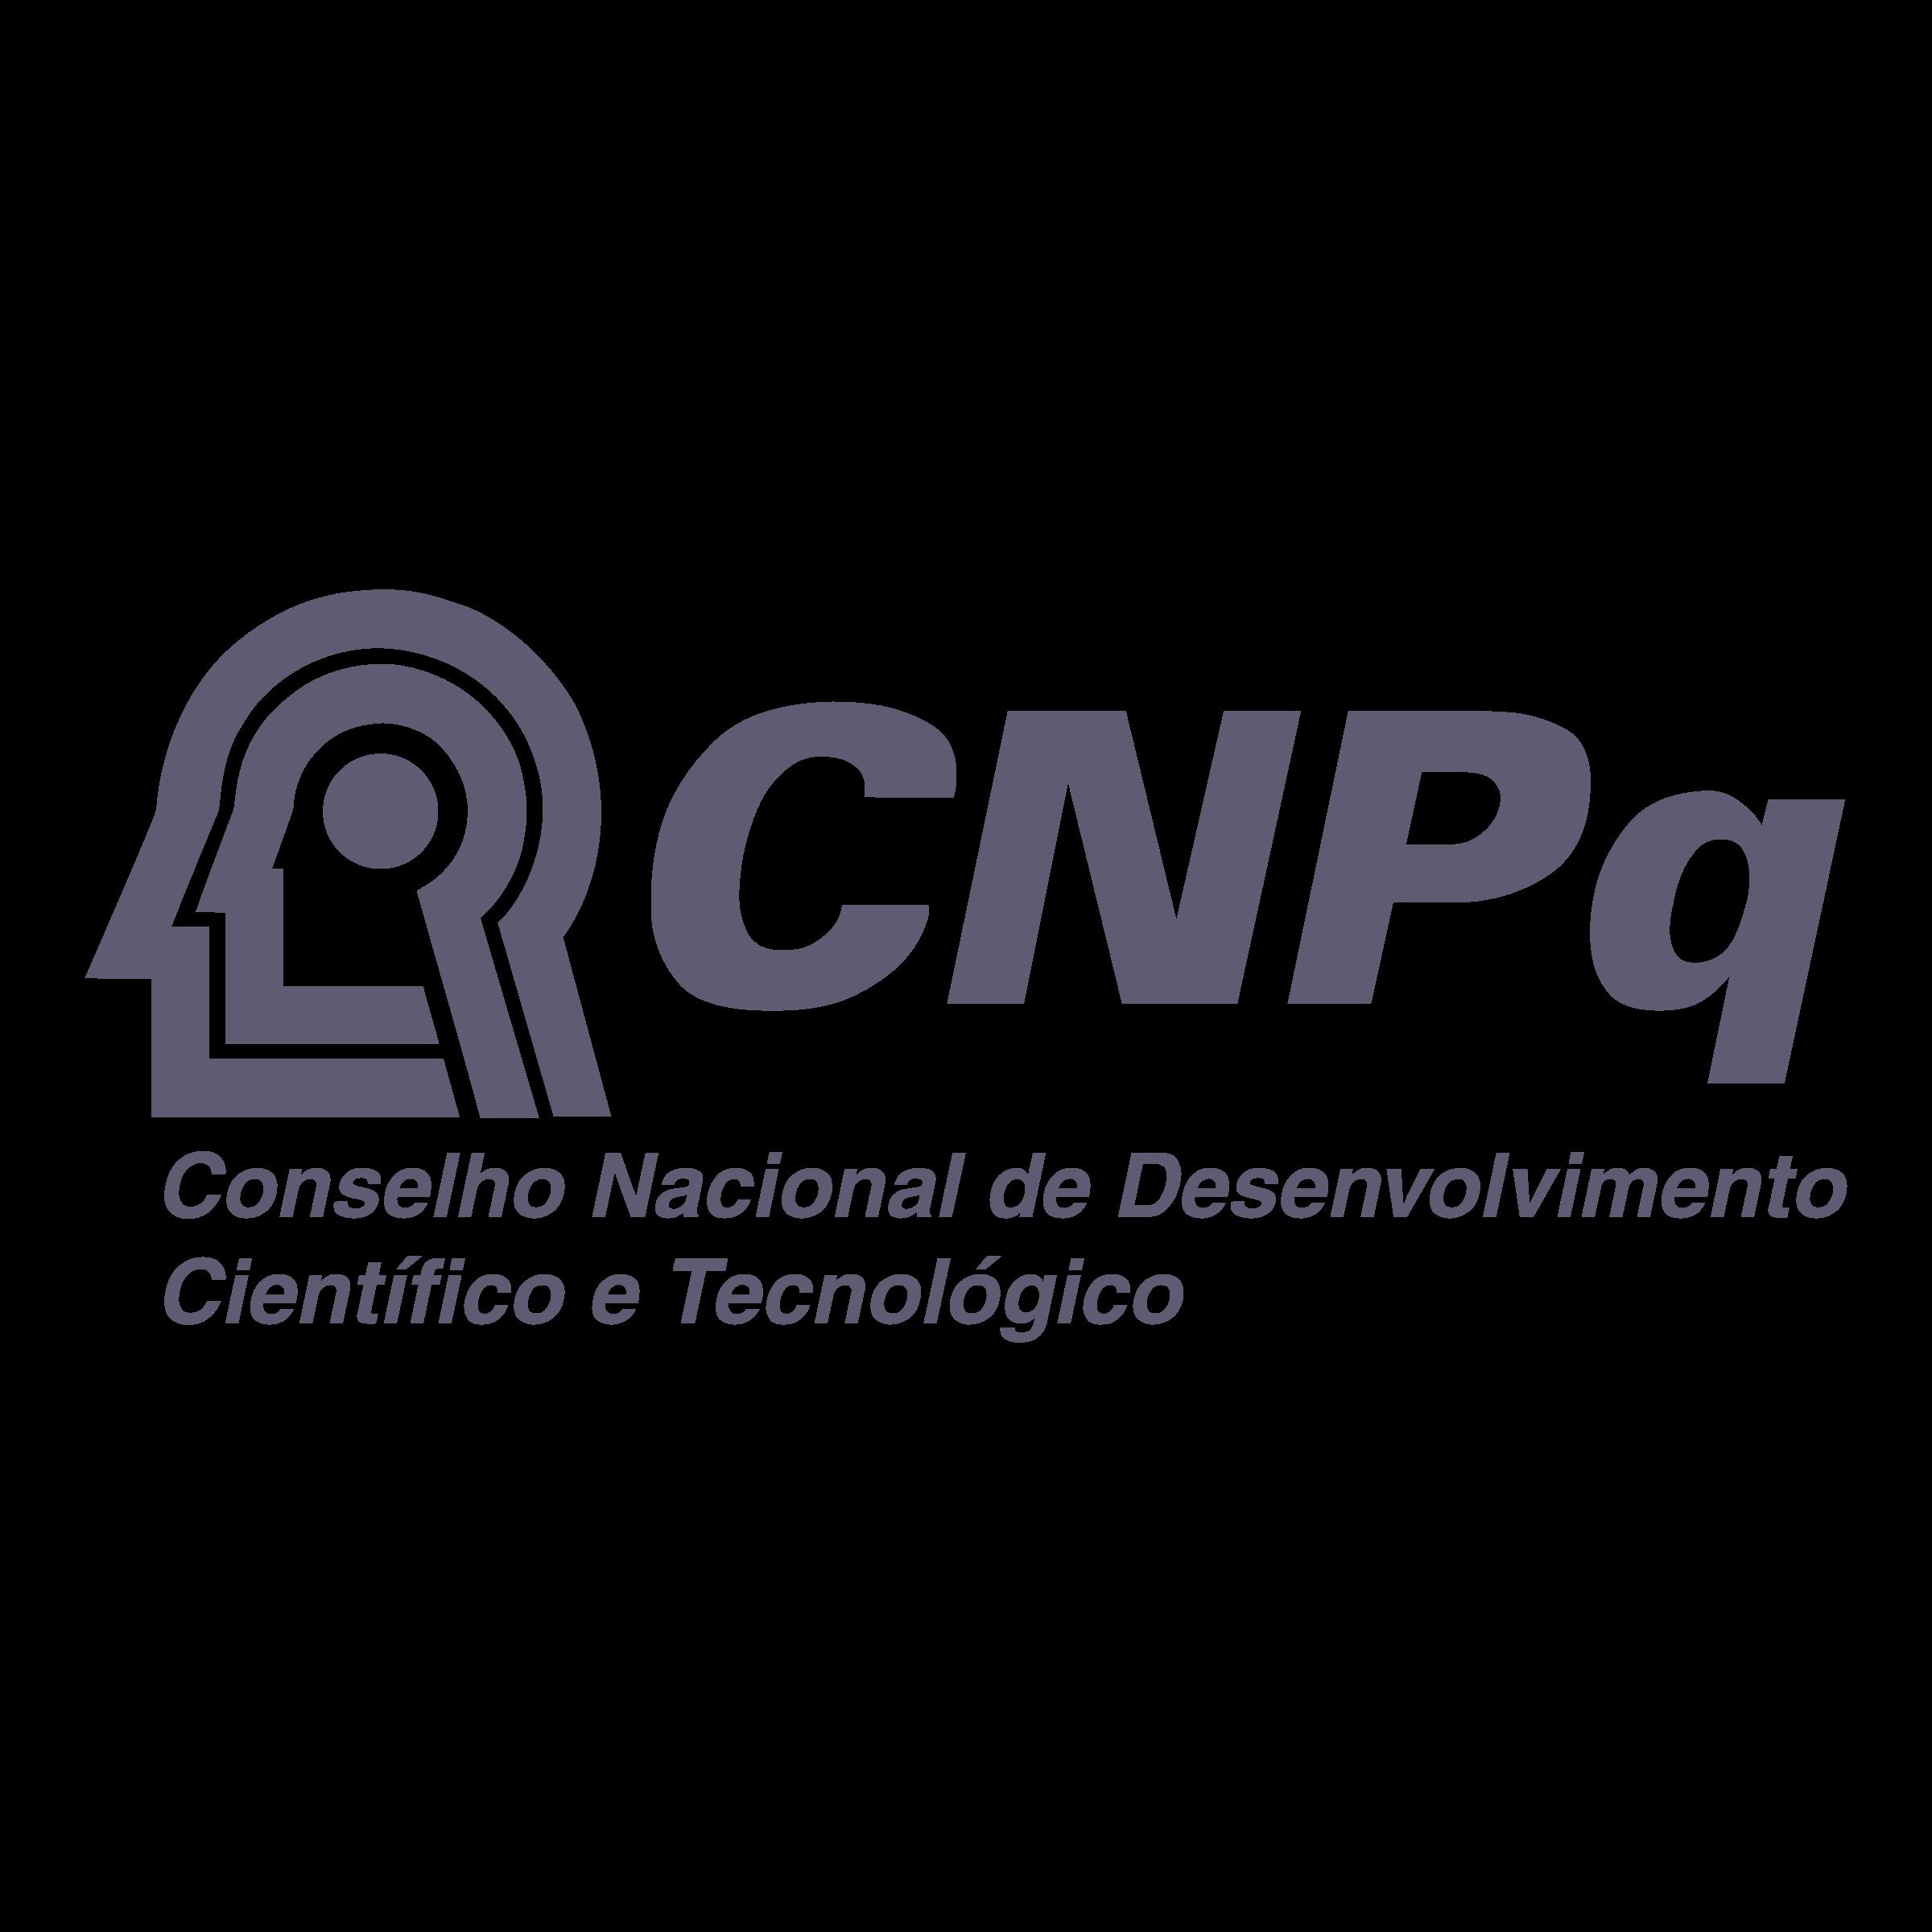 CNPq Logo PNG Transparent & SVG Vector.